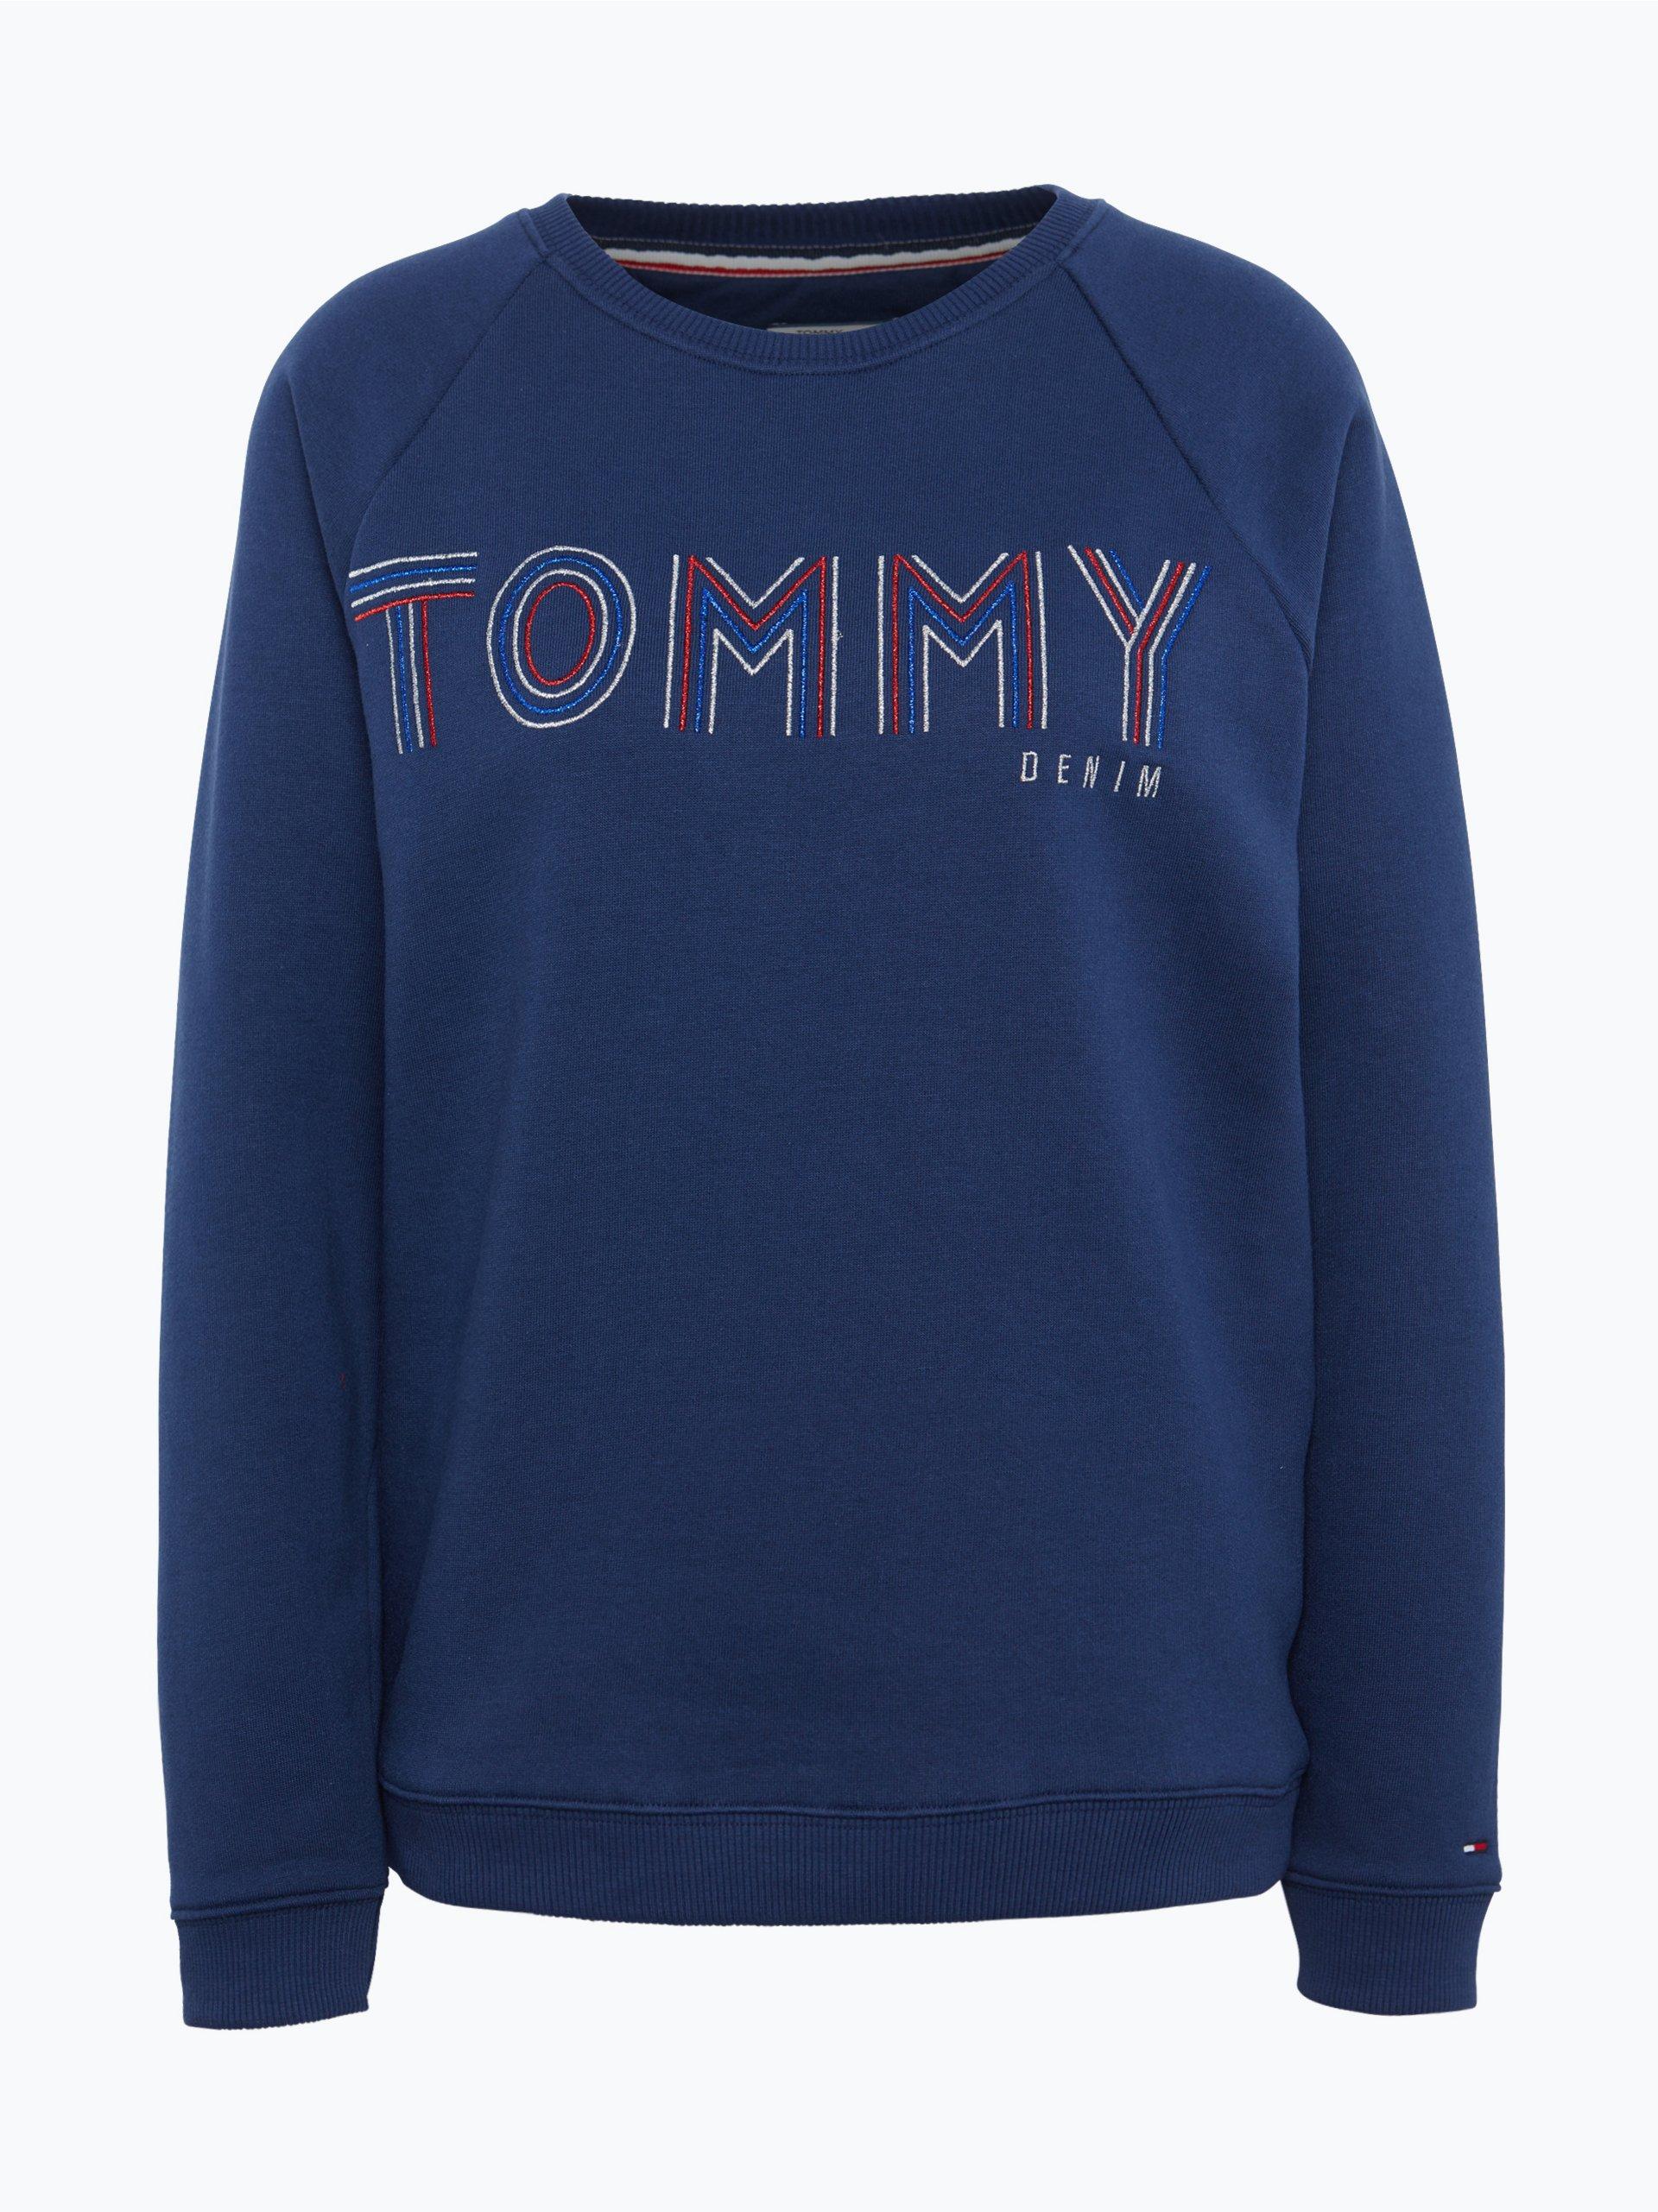 tommy jeans damen sweatshirt marine uni online kaufen. Black Bedroom Furniture Sets. Home Design Ideas